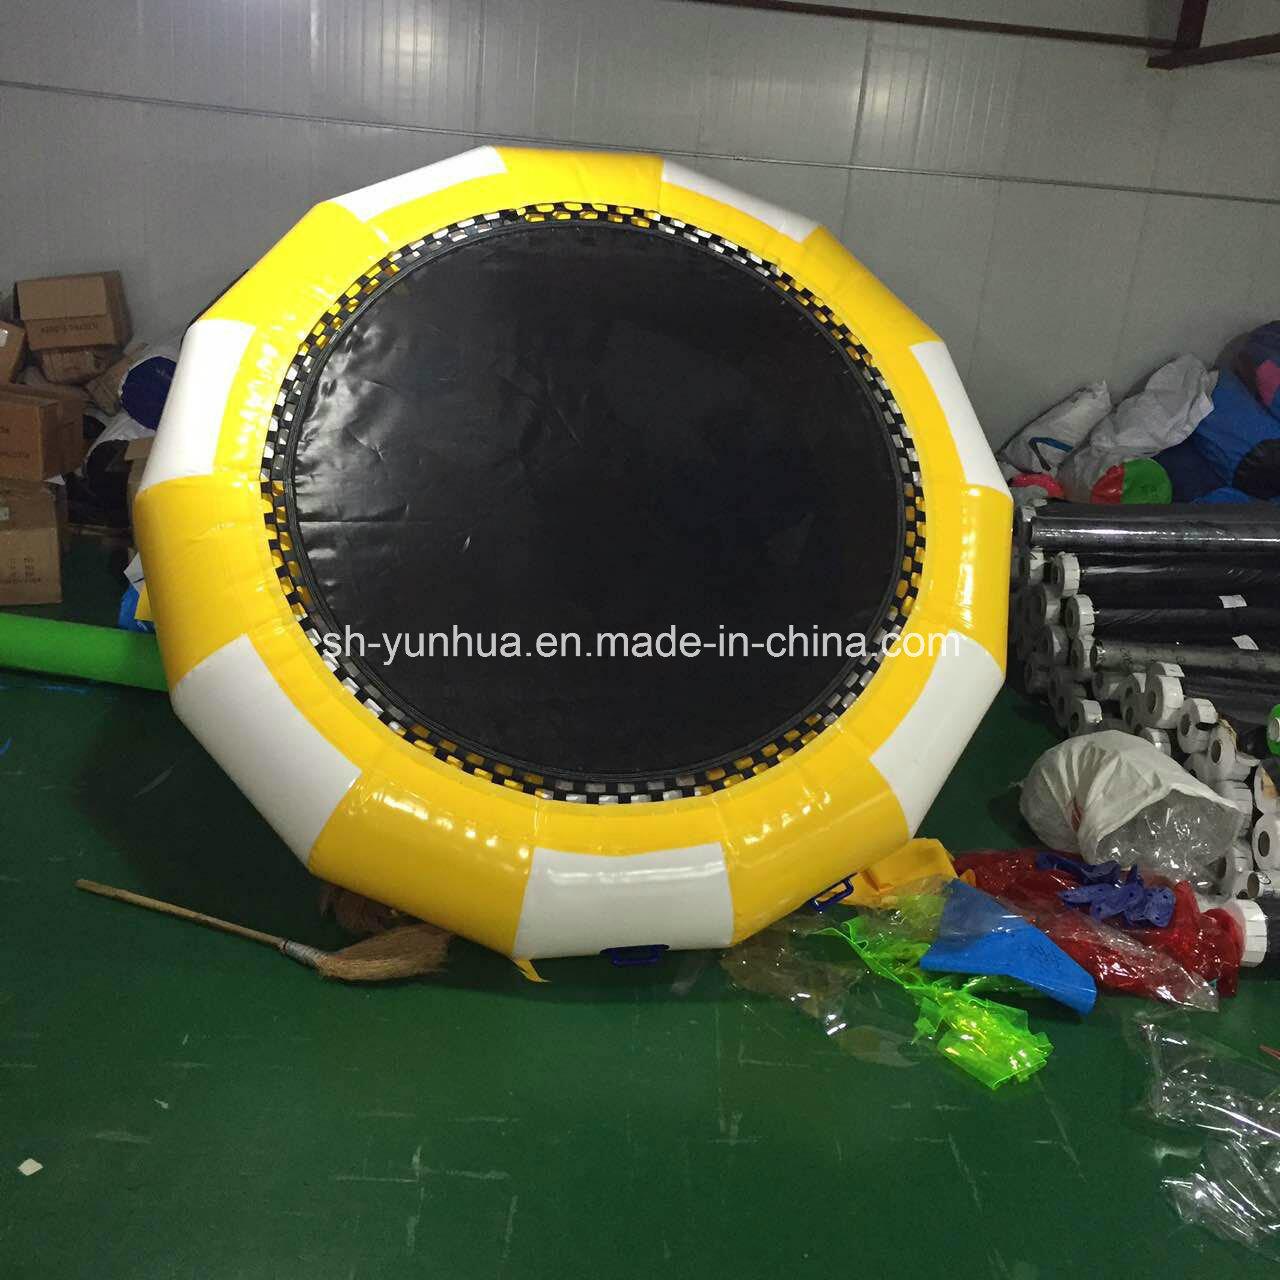 Inflatable Floating Water Park/ Amusement Park /Jumping Castle